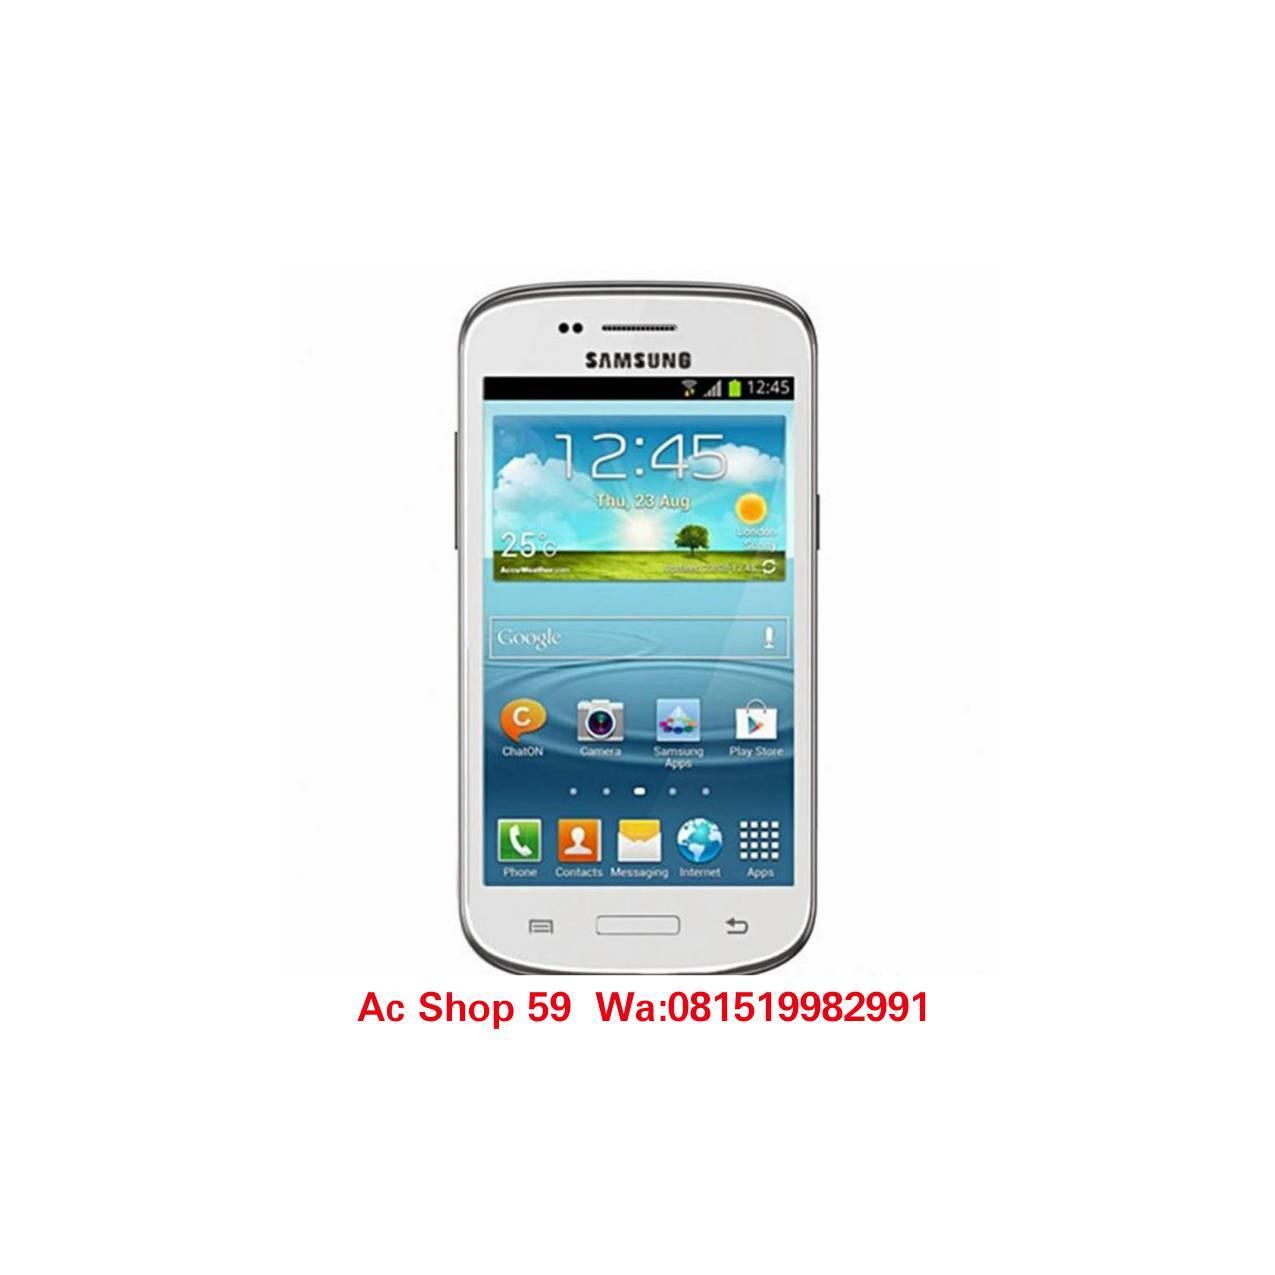 Beli Flipcover Samsung Infinite Store Marwanto606 Produk Ukm Bumn Sprei Waterproof Anti Ompol Motif Hp Galaxy Dual Sim Android New Garansi Resmi